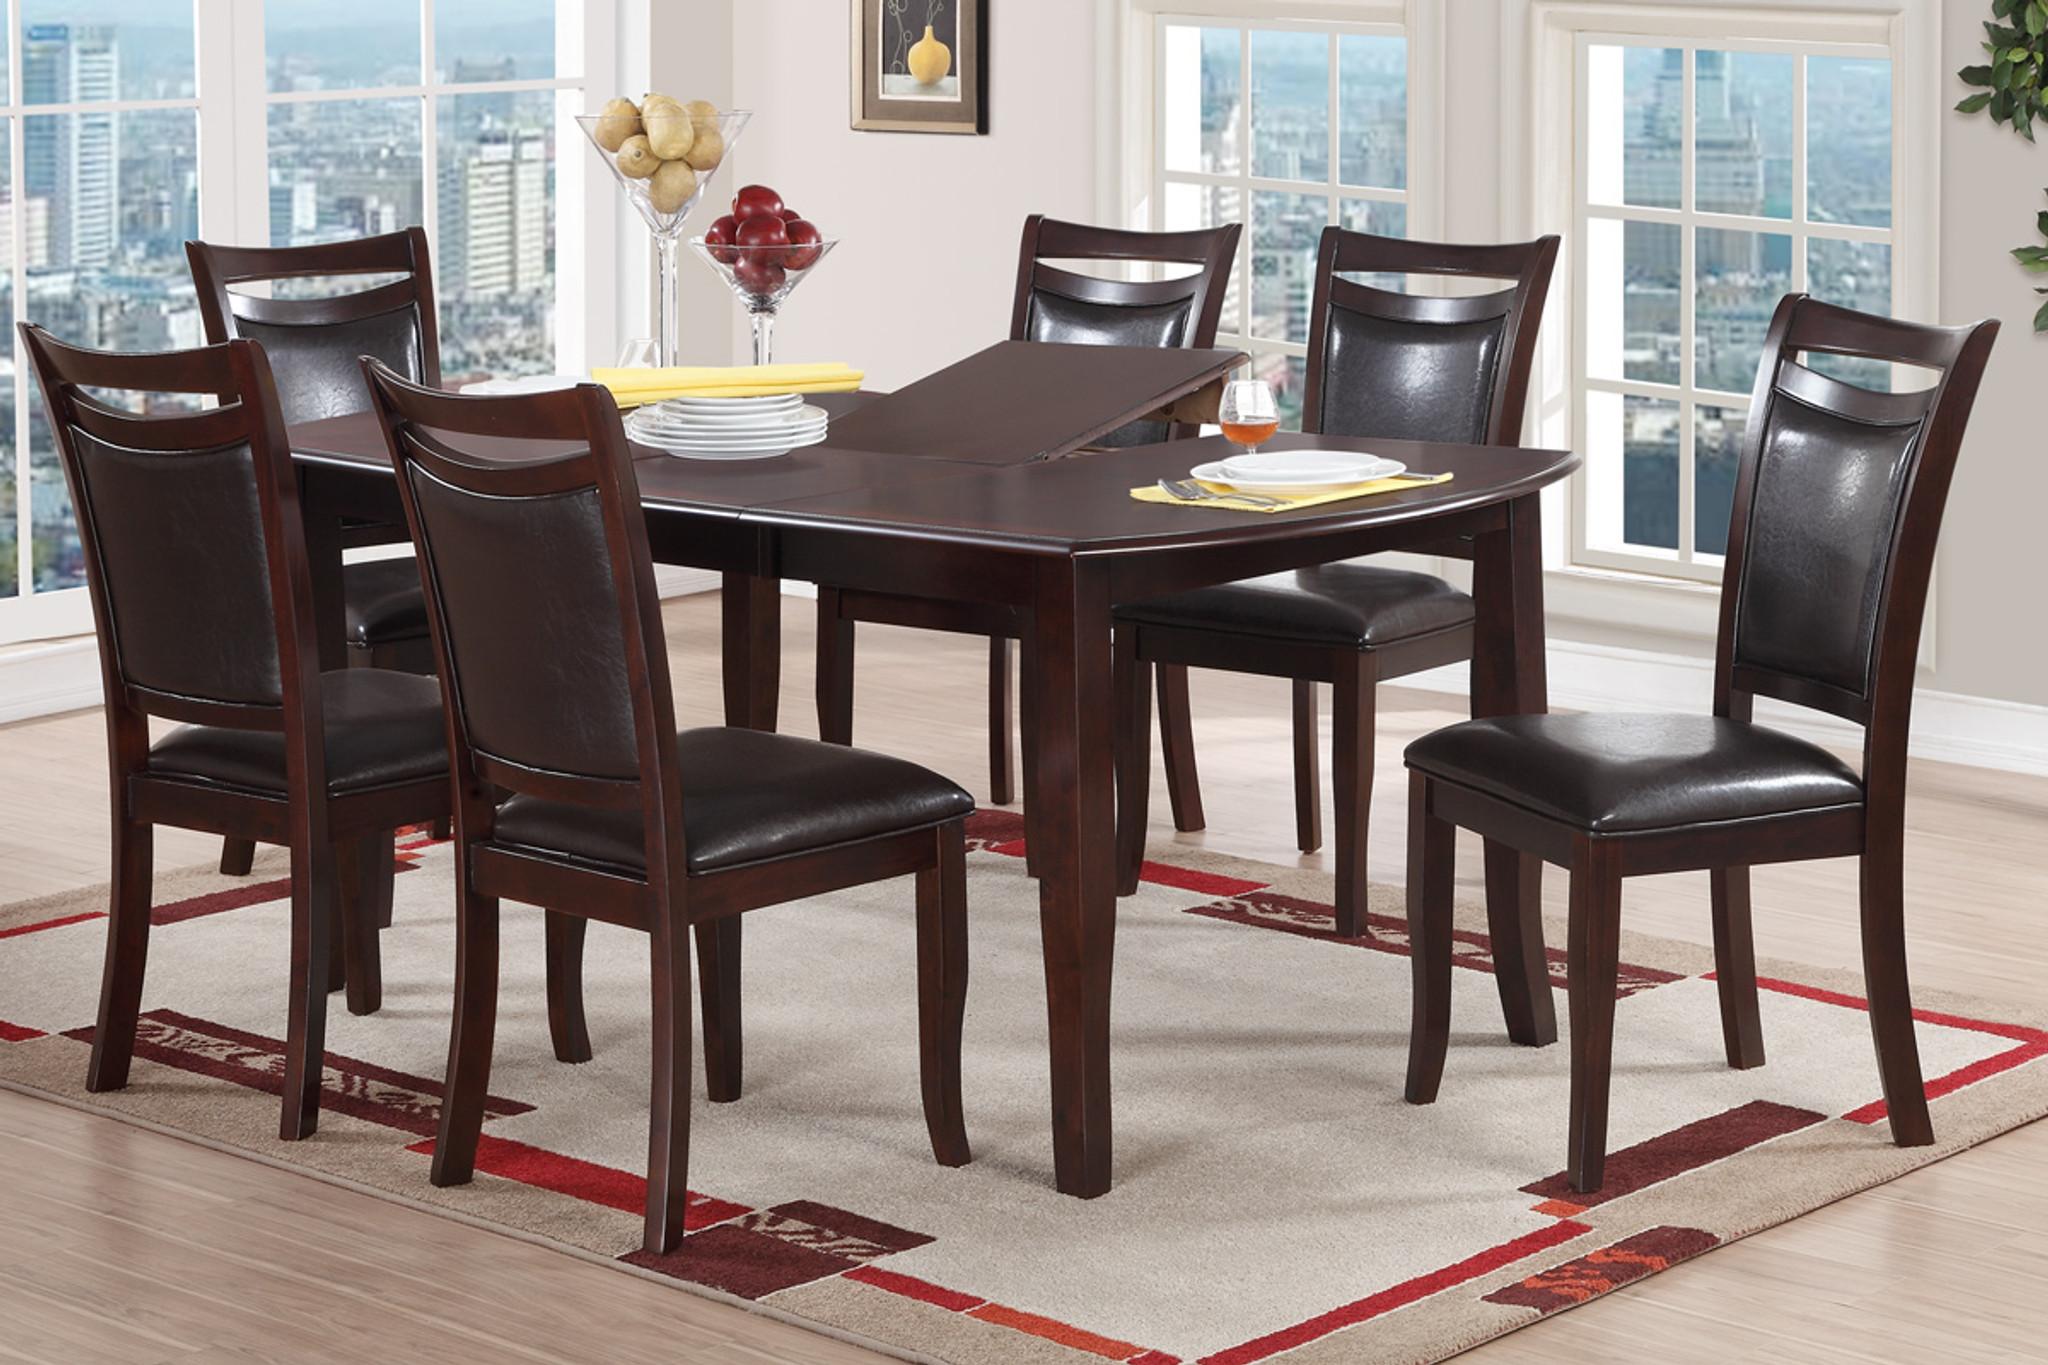 Pleasant Contemporary Rectangular Dark Brown 7 Pieces Dining Room Set Download Free Architecture Designs Sospemadebymaigaardcom